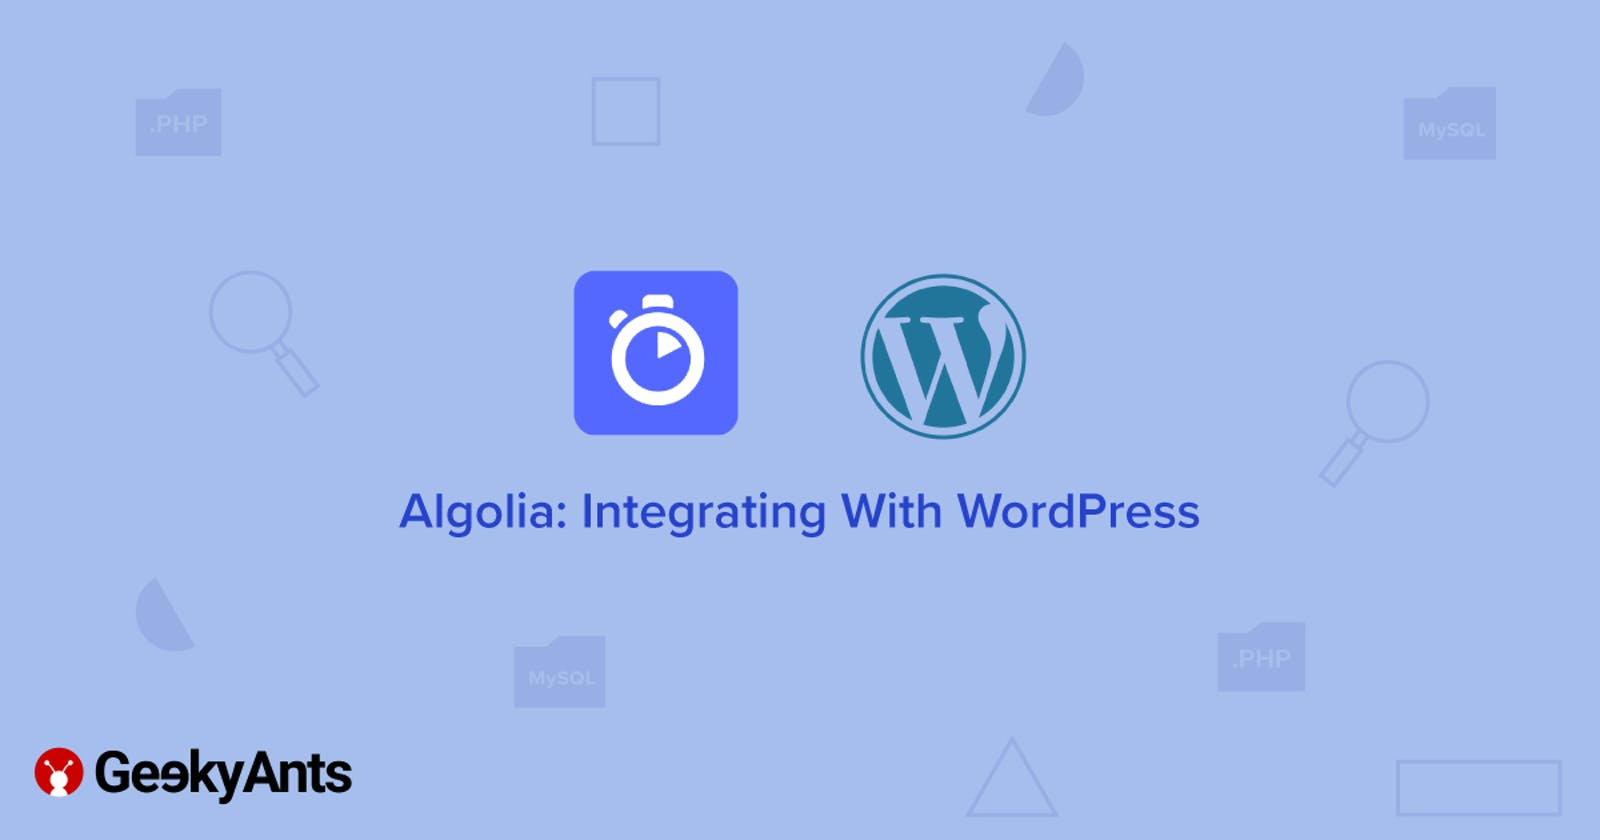 Algolia: Integrating With WordPress